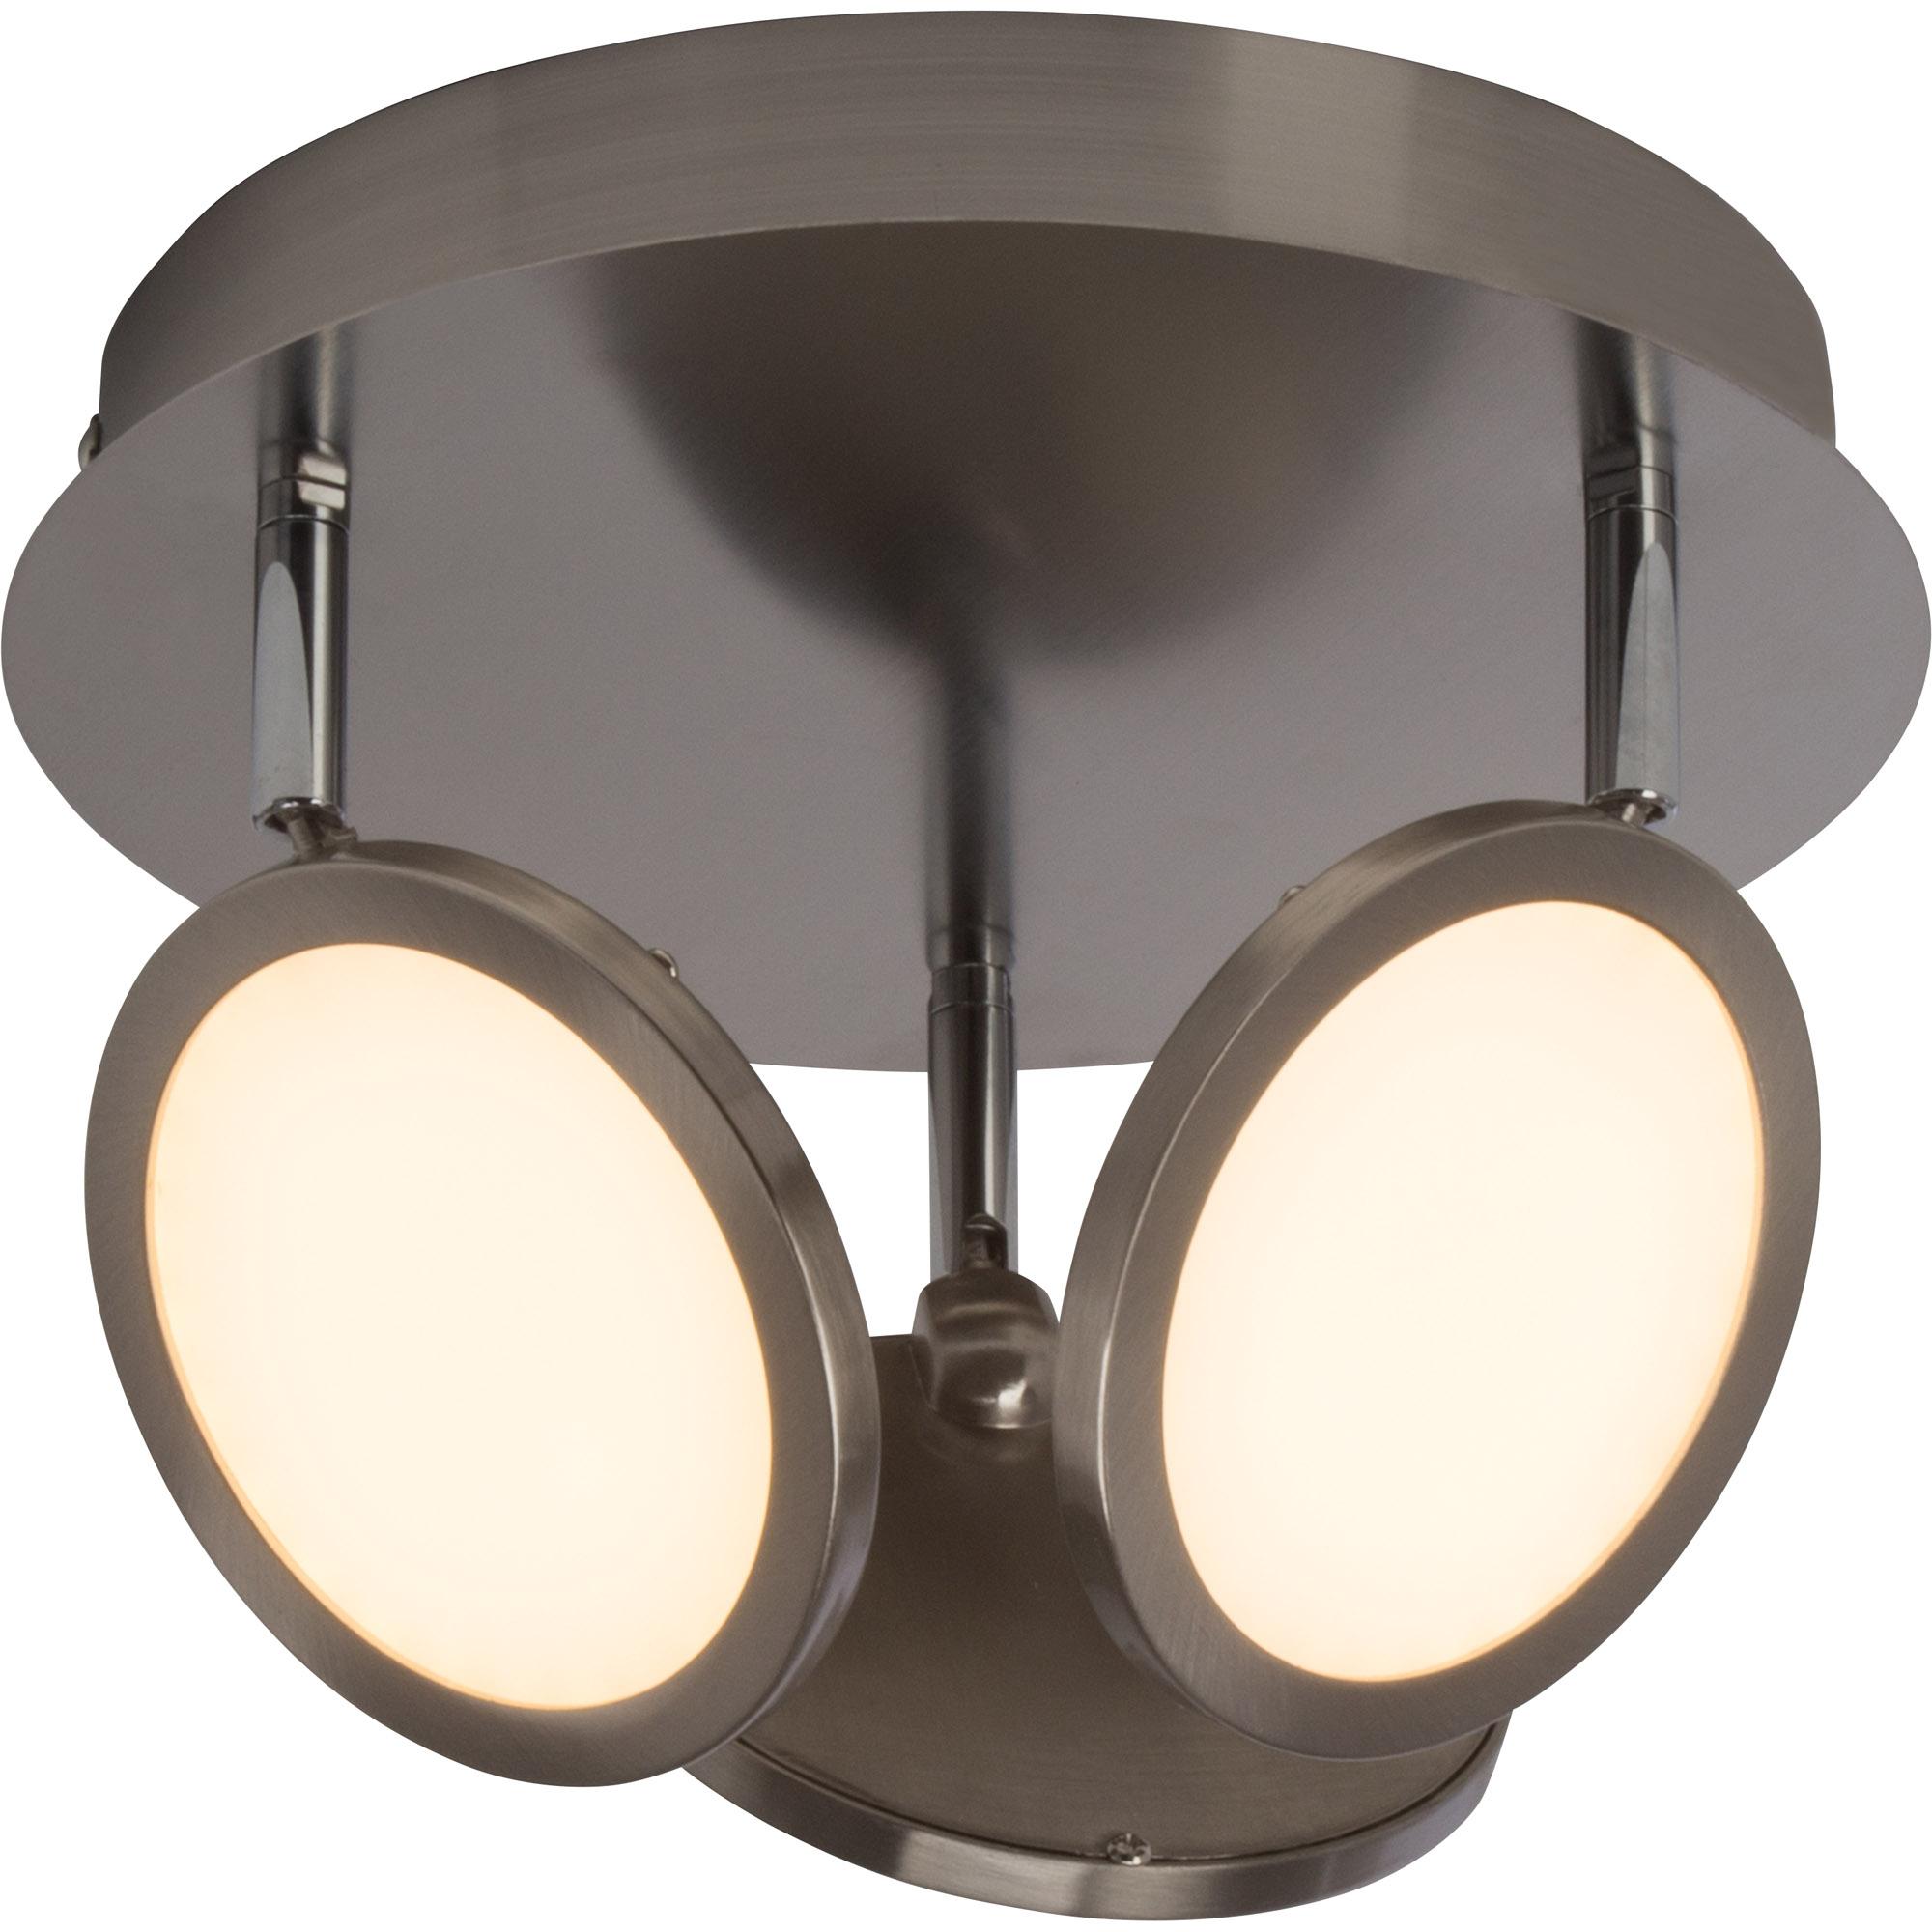 modernes led spotrondell deckenleuchte dimmbar 3x 5w led integriert 3x 500 lumen 3000k. Black Bedroom Furniture Sets. Home Design Ideas